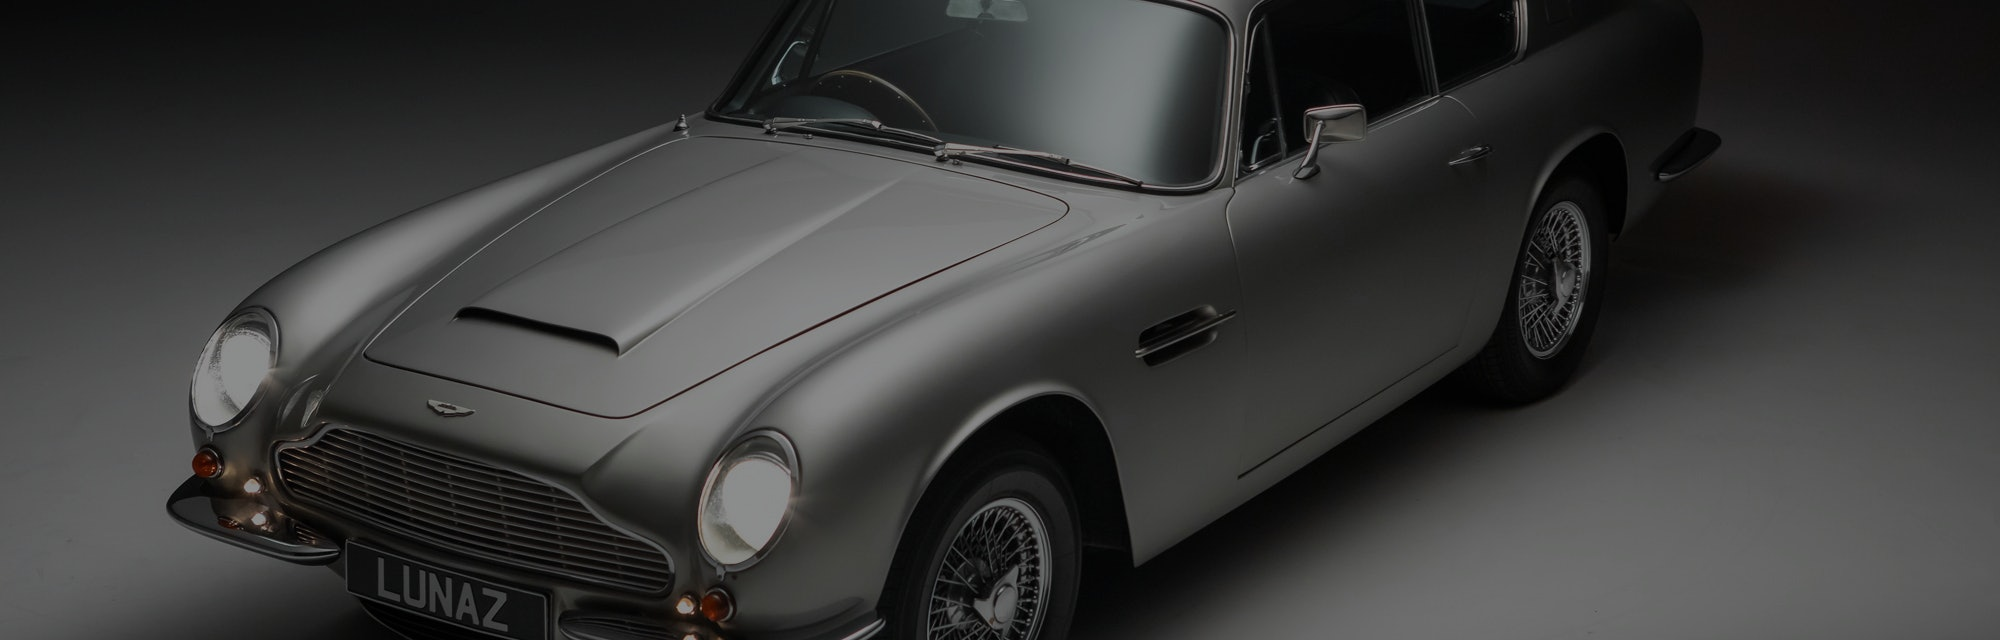 Design firm Lunaz Group has begun retrofitting classic Aston Martin DB6 vehicles with electric inter...